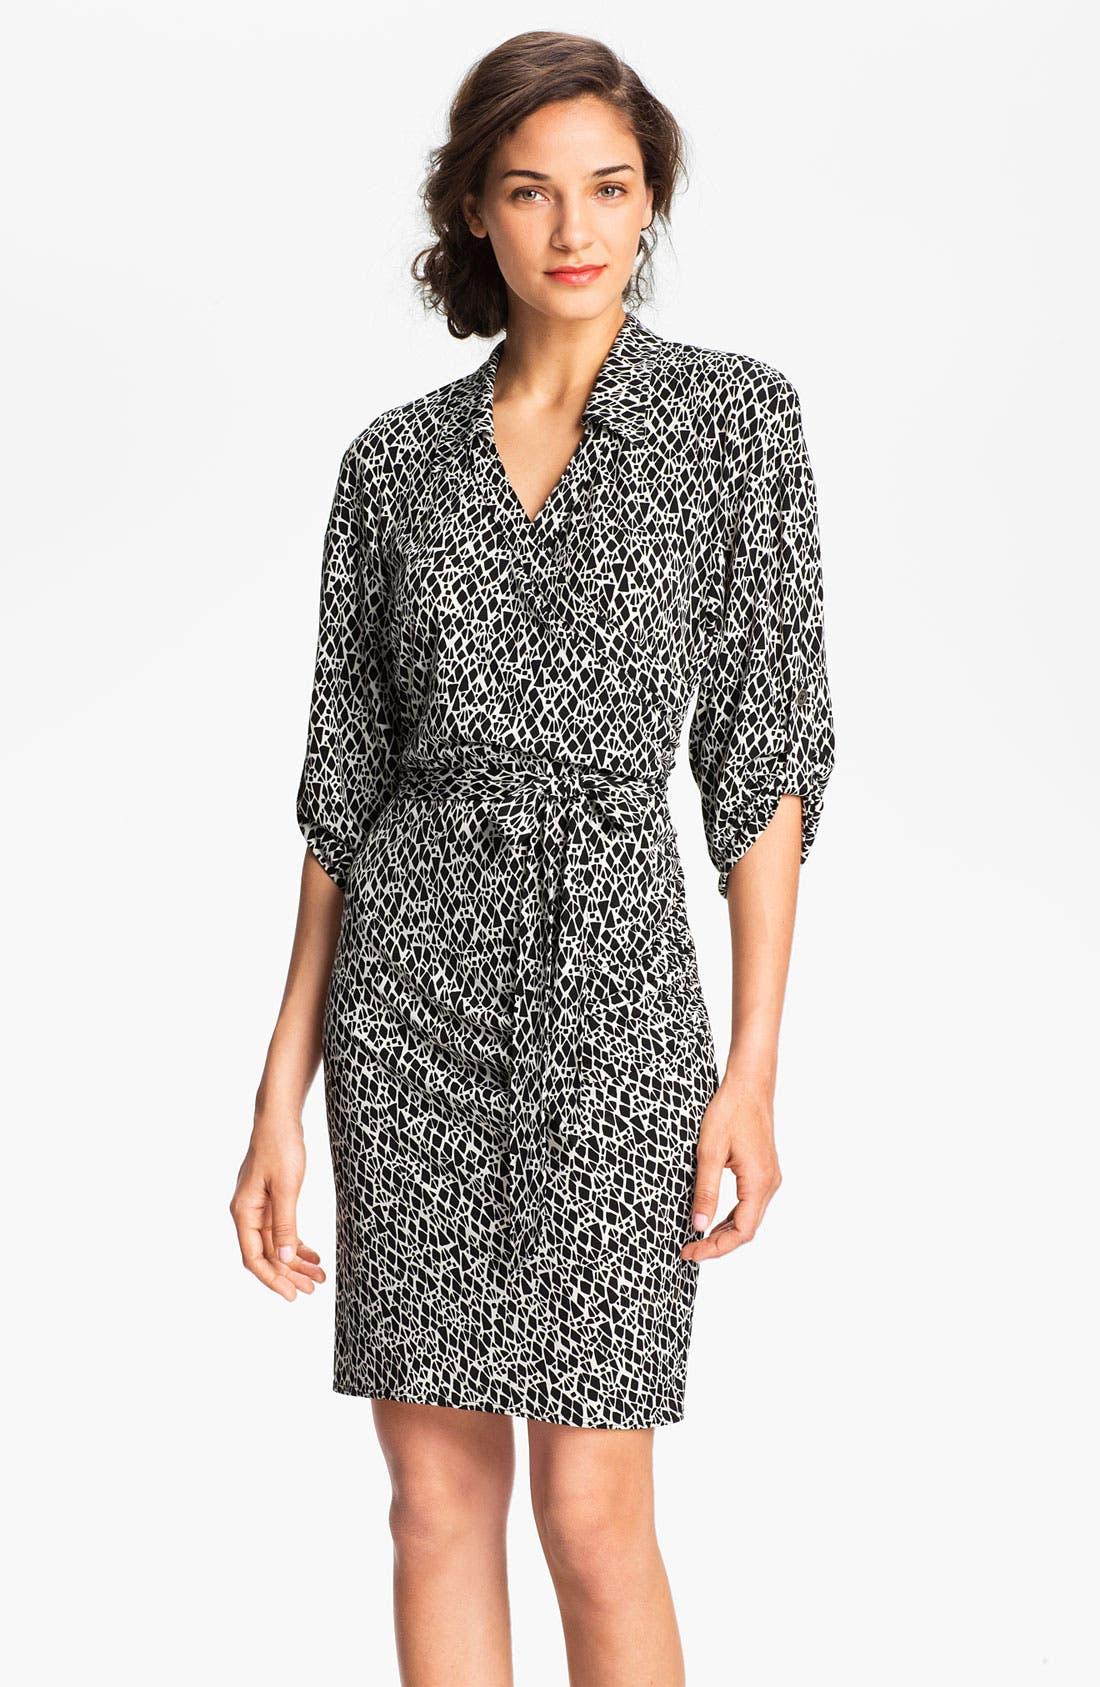 Alternate Image 1 Selected - Laundry by Shelli Segal Print Jersey Shirtdress